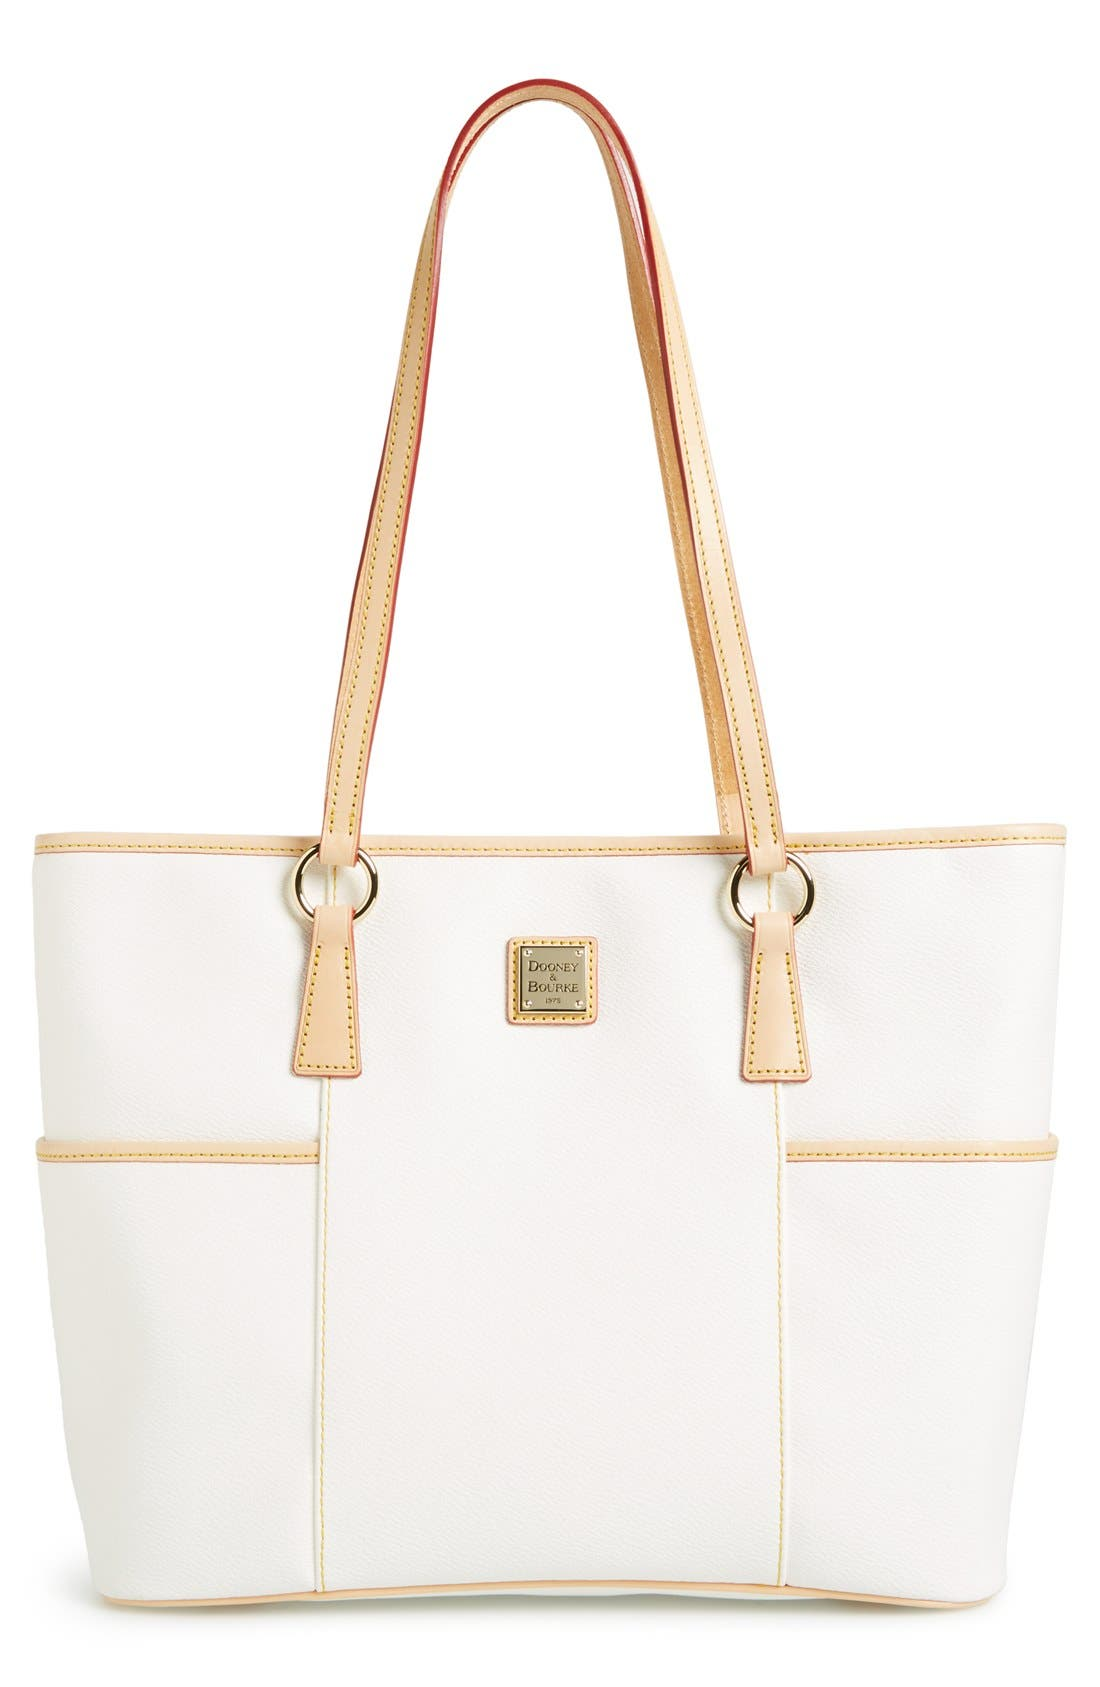 Main Image - Dooney & Bourke 'Helena' Shopper